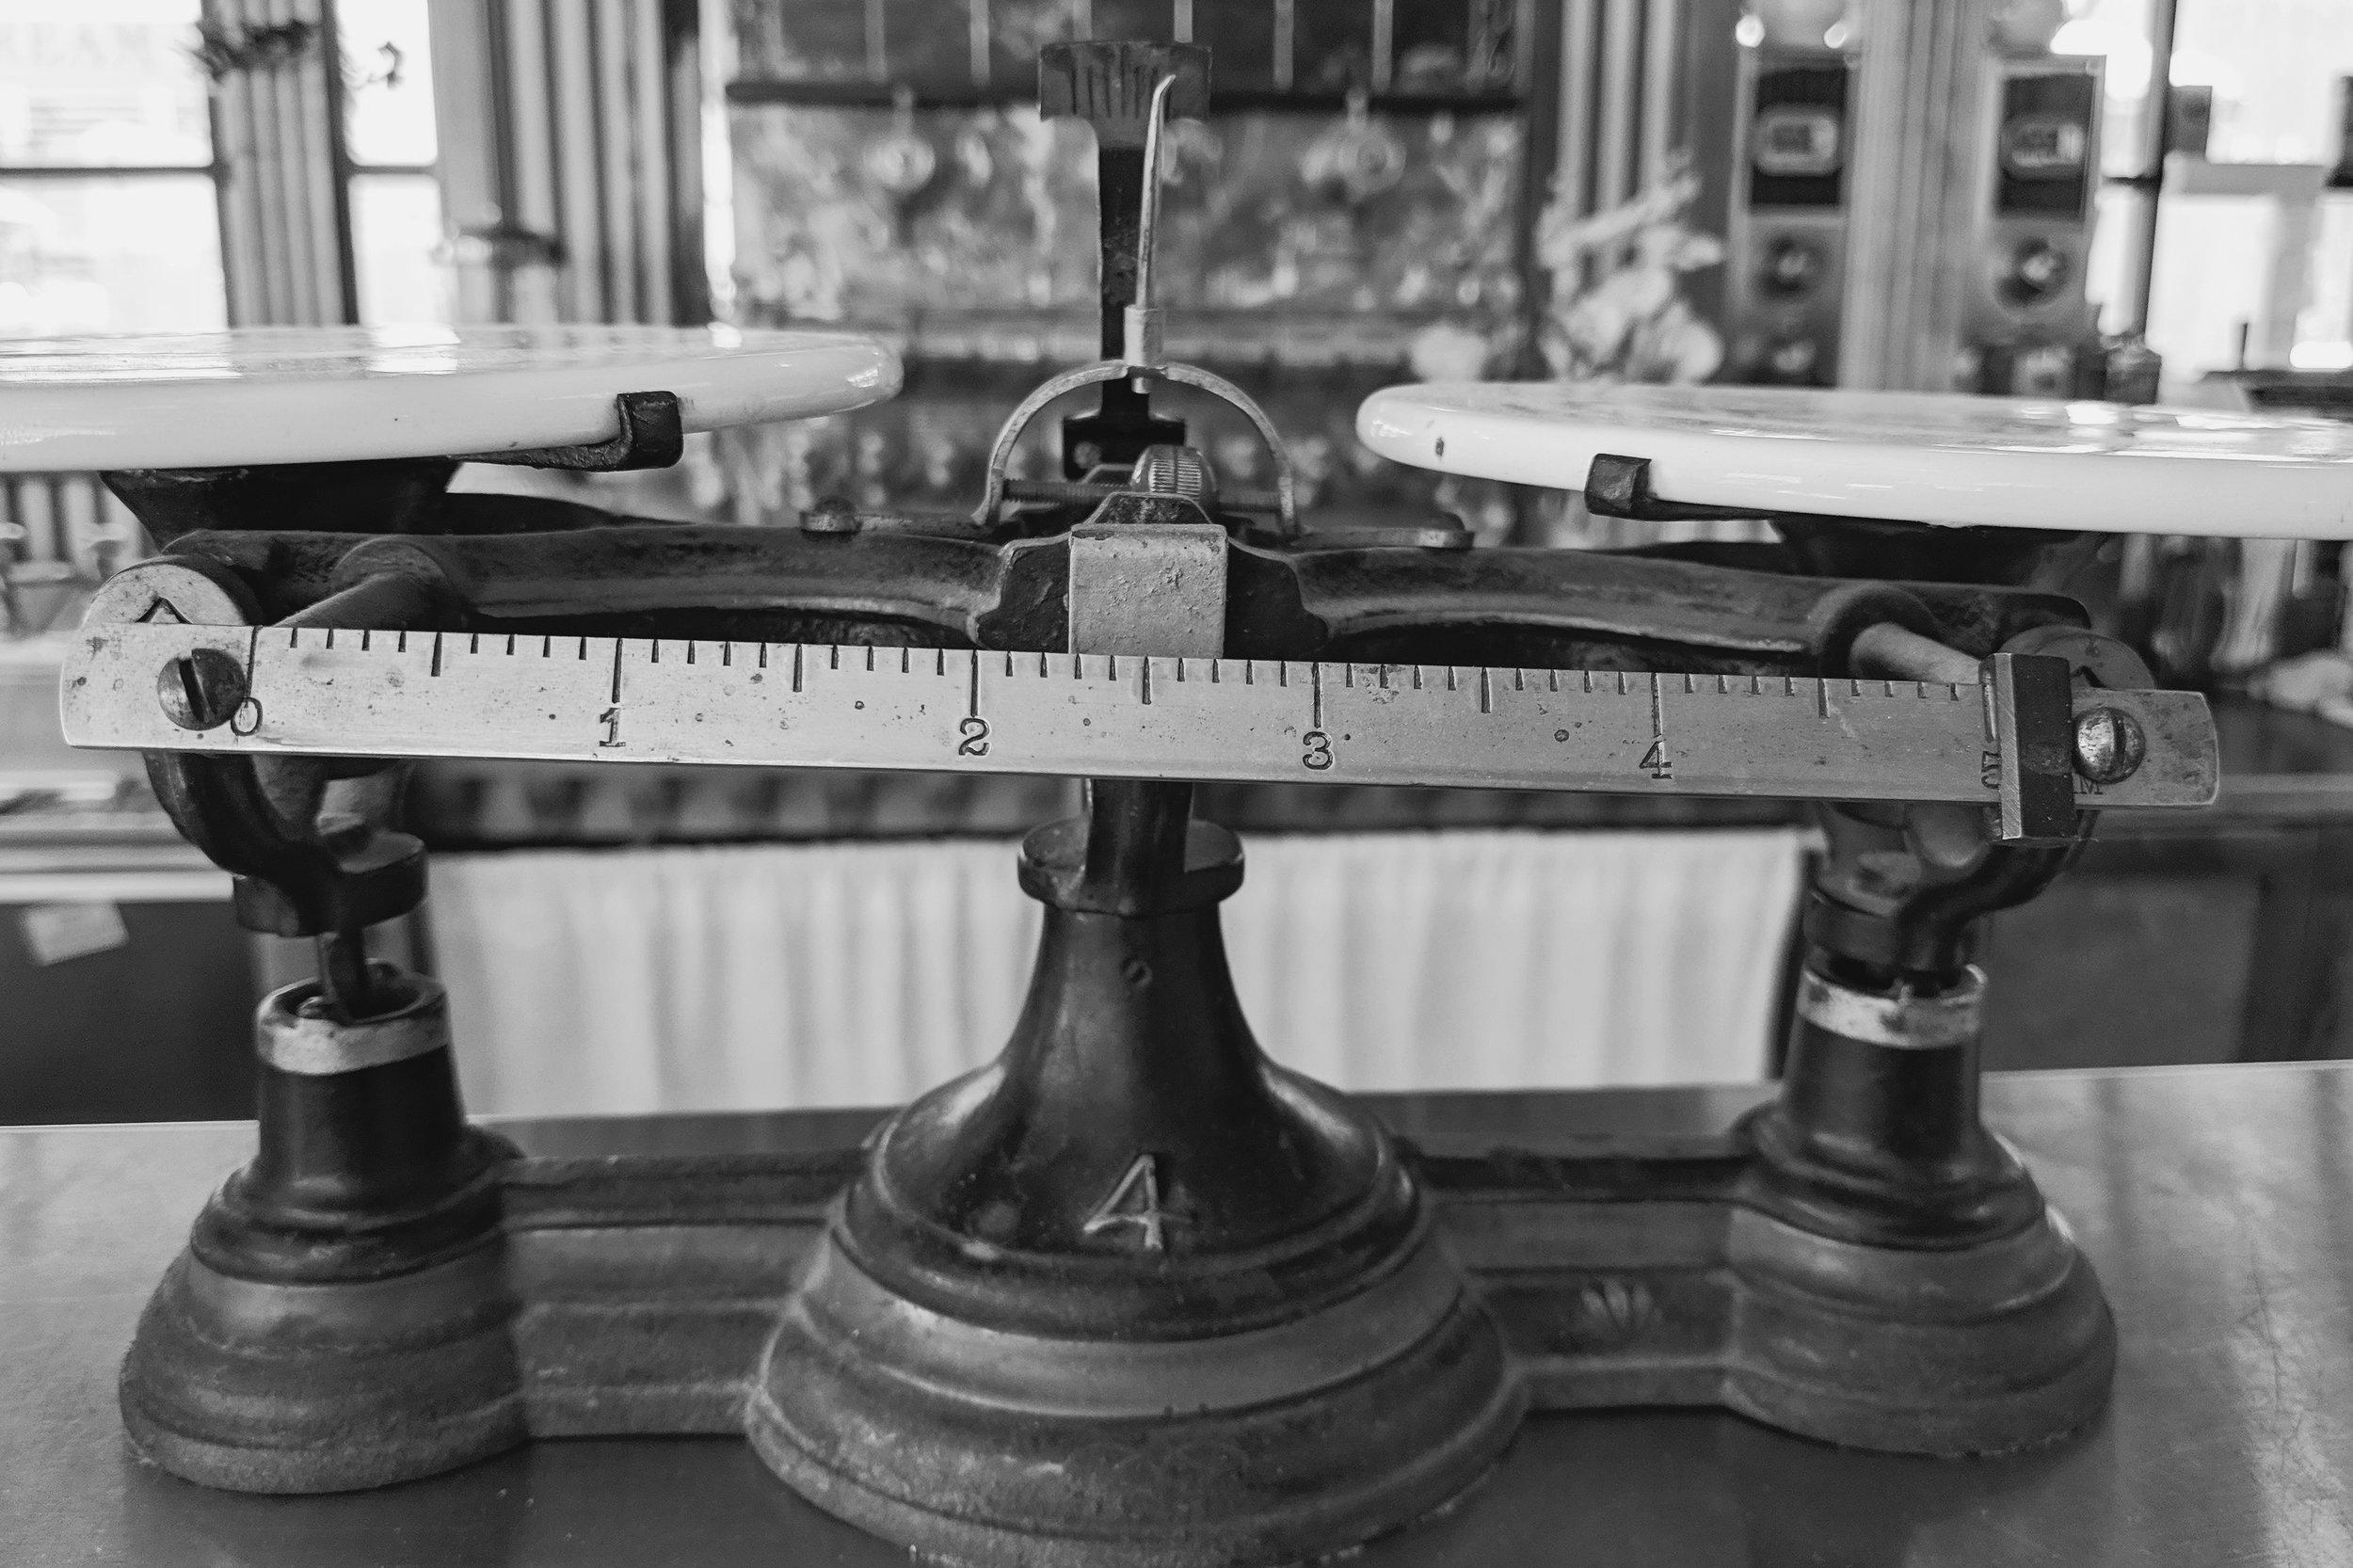 Day 80- 365 Day B&W Photo Challenge - Antique Balance Scale. Google Pixel 3, VSCO B3 Preset